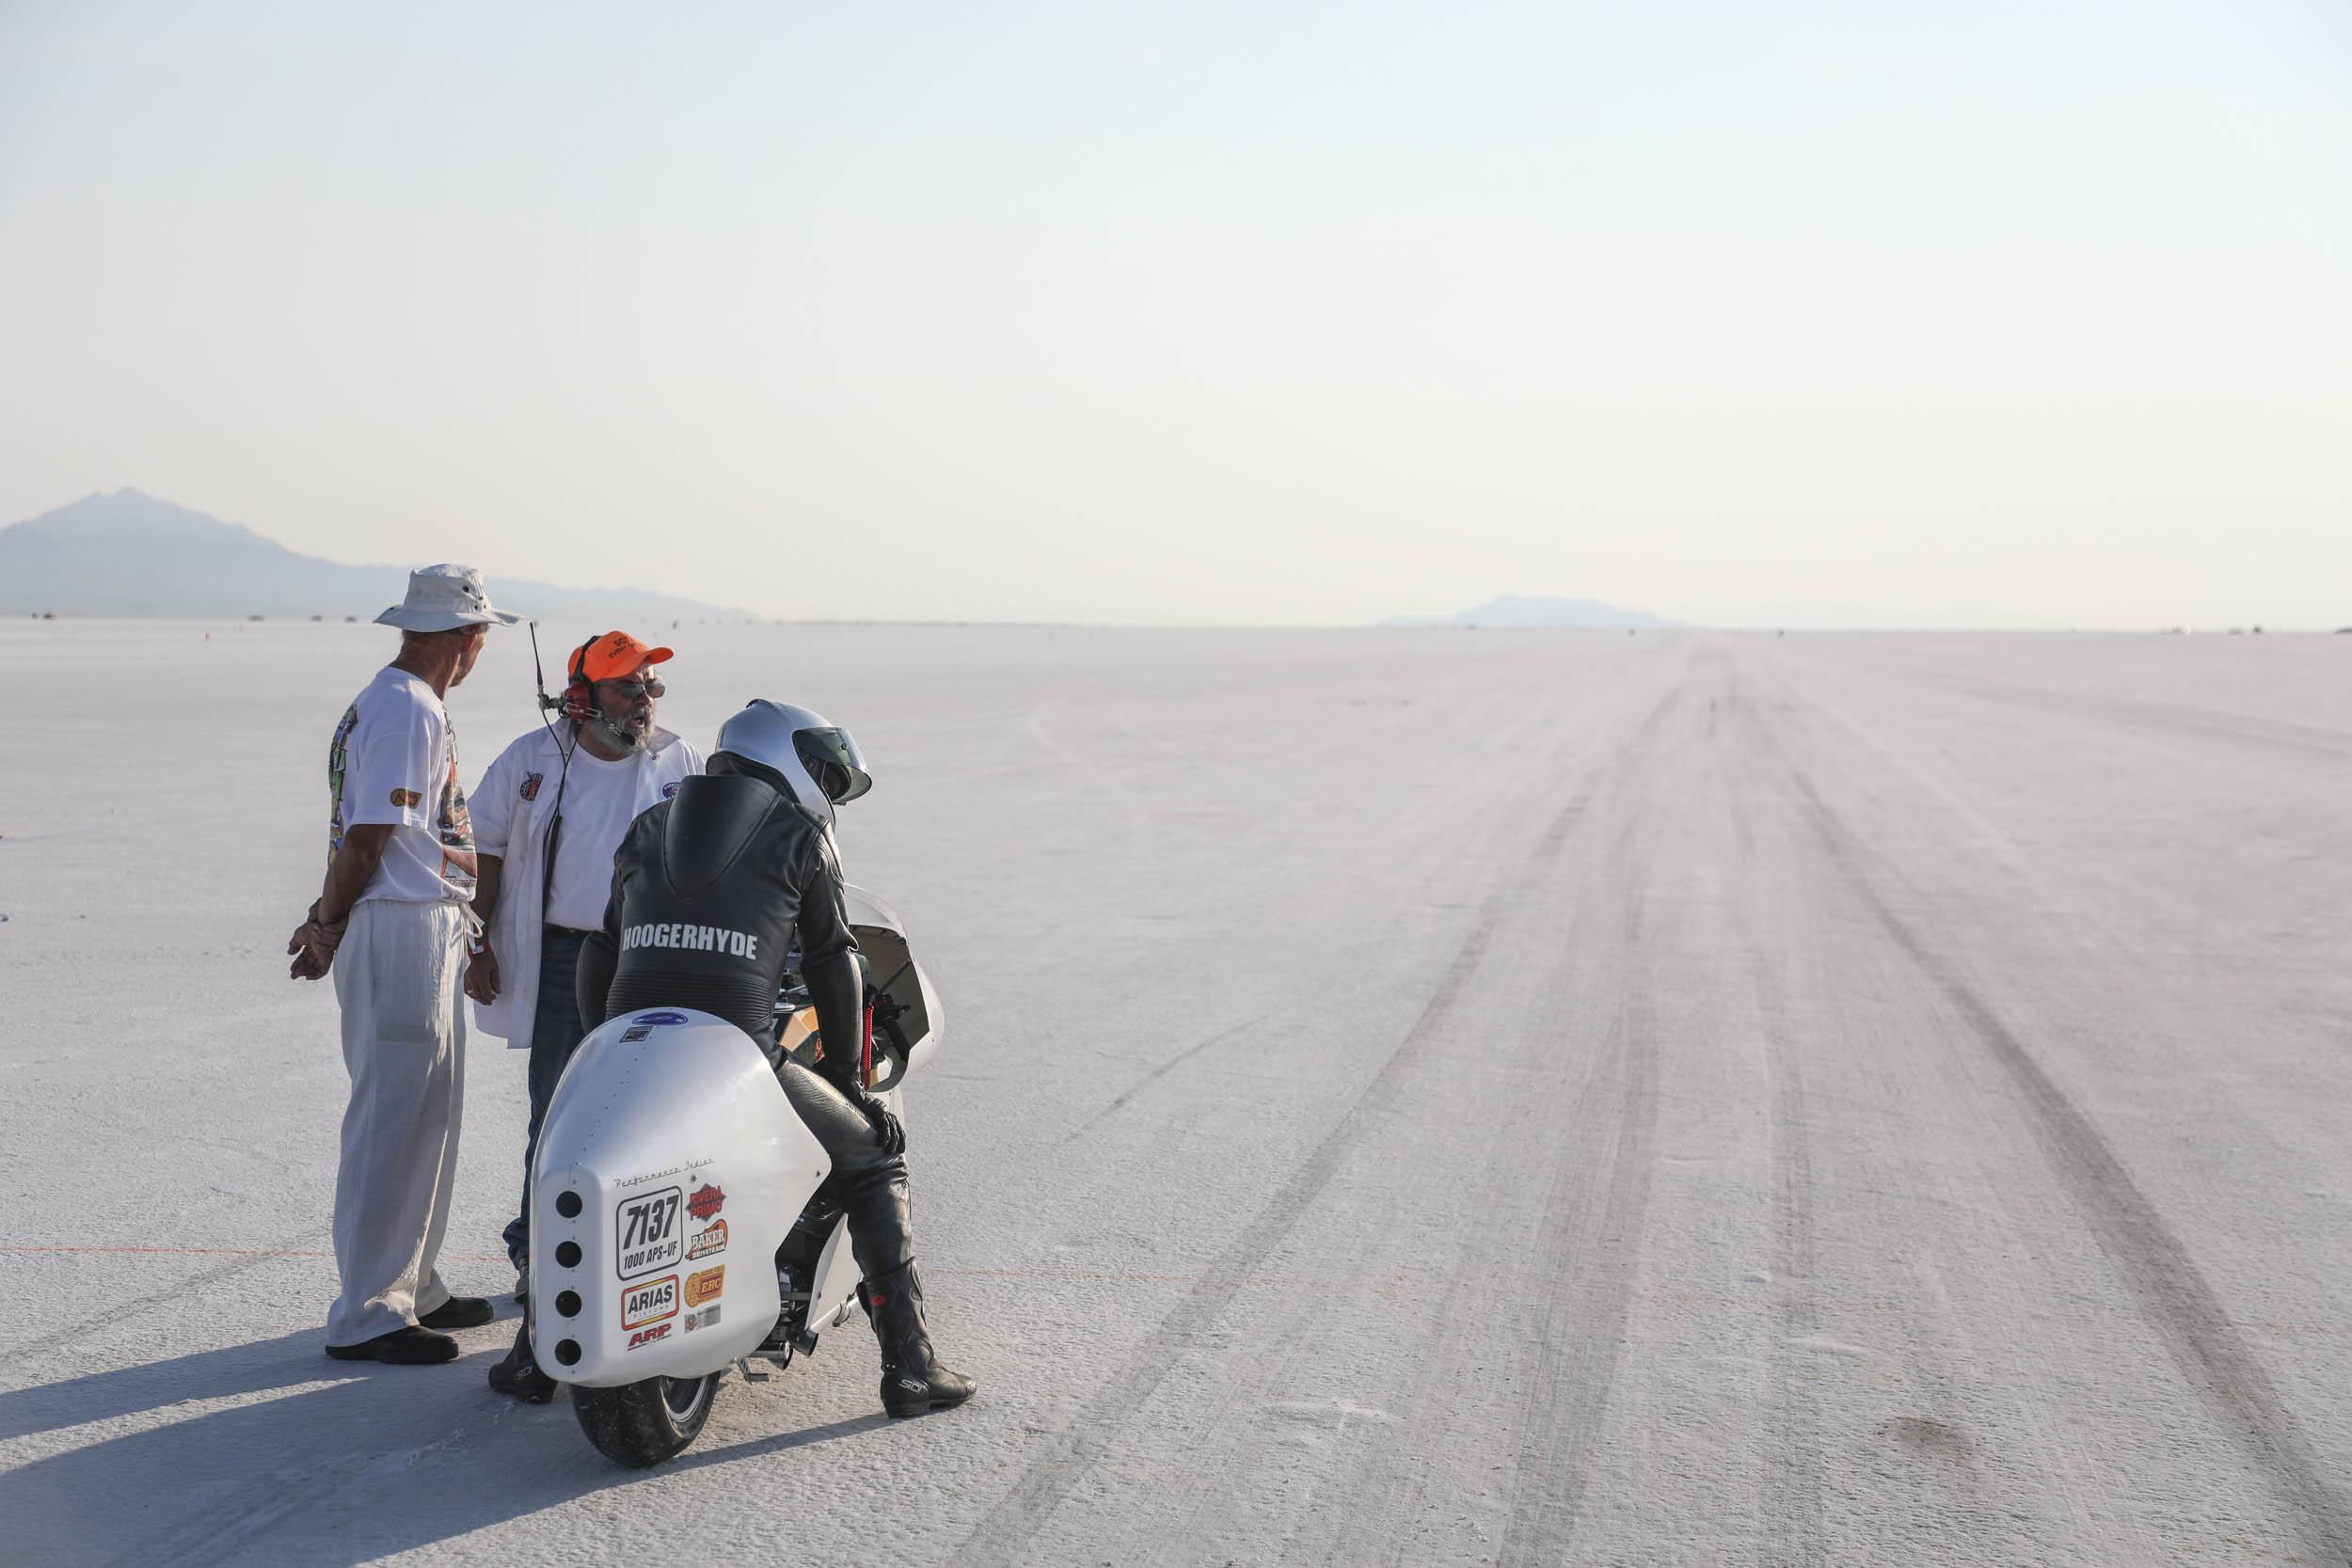 Motorcycle at Bonneville Salt Flats Speed Week